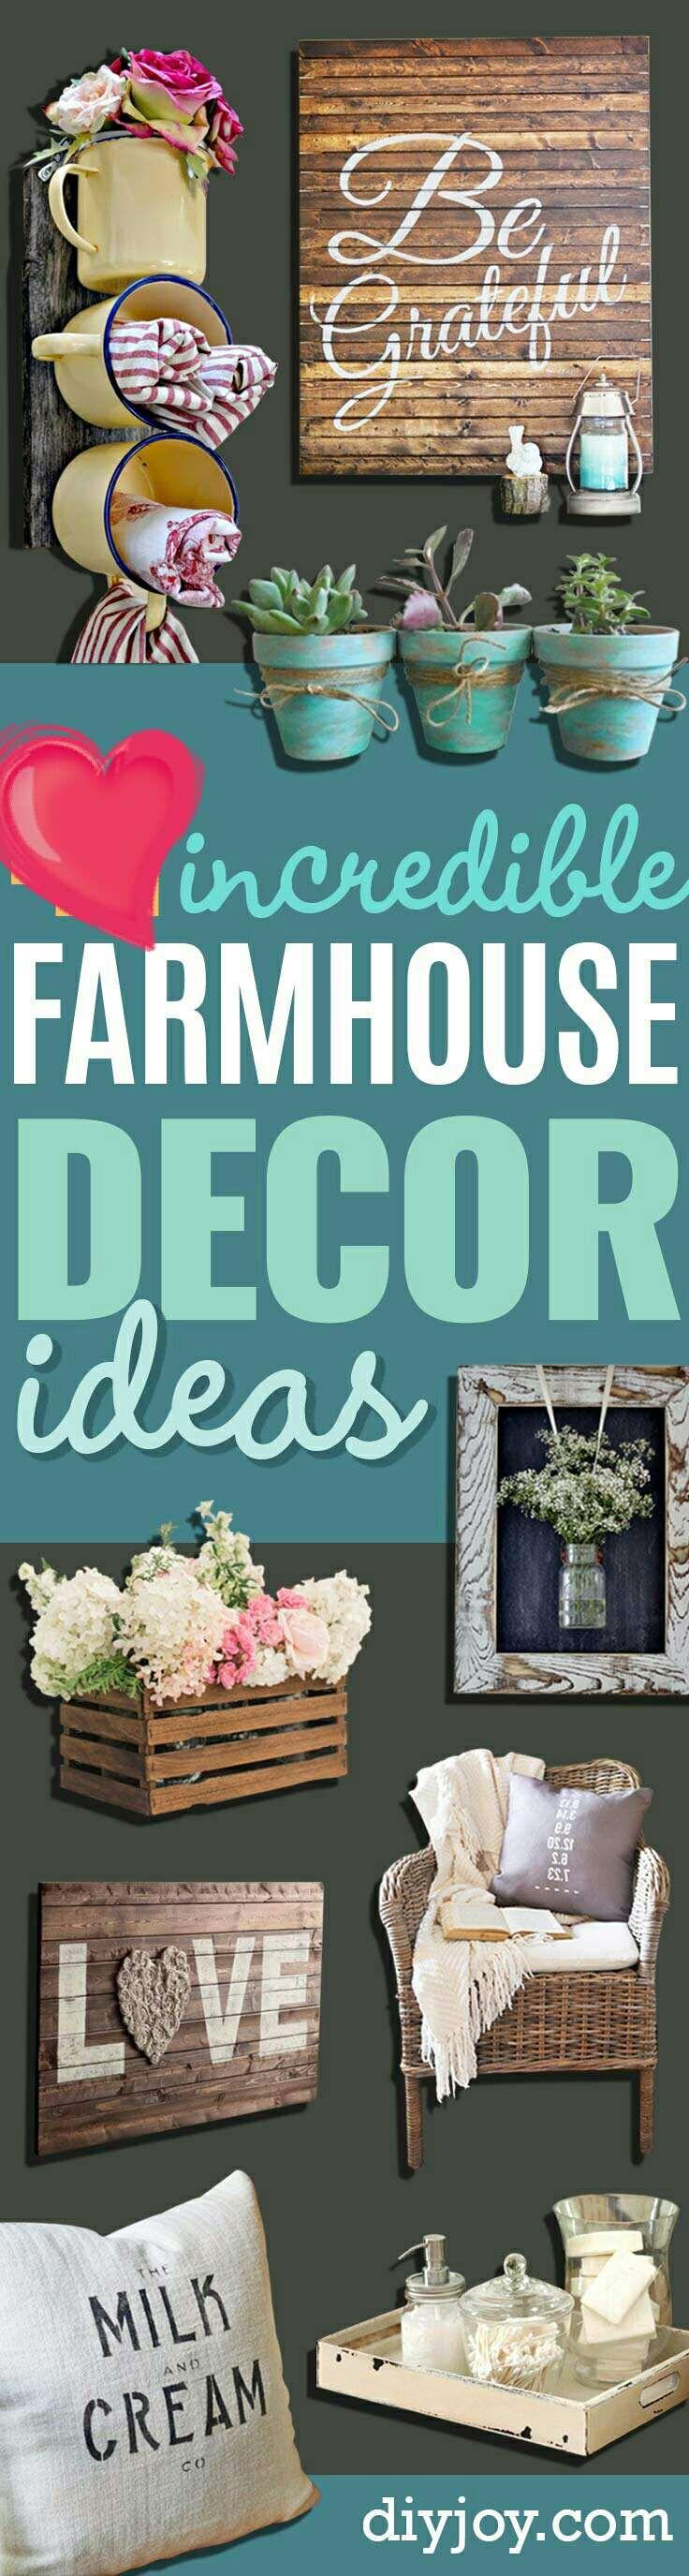 Farmhouse Decor Inspirations